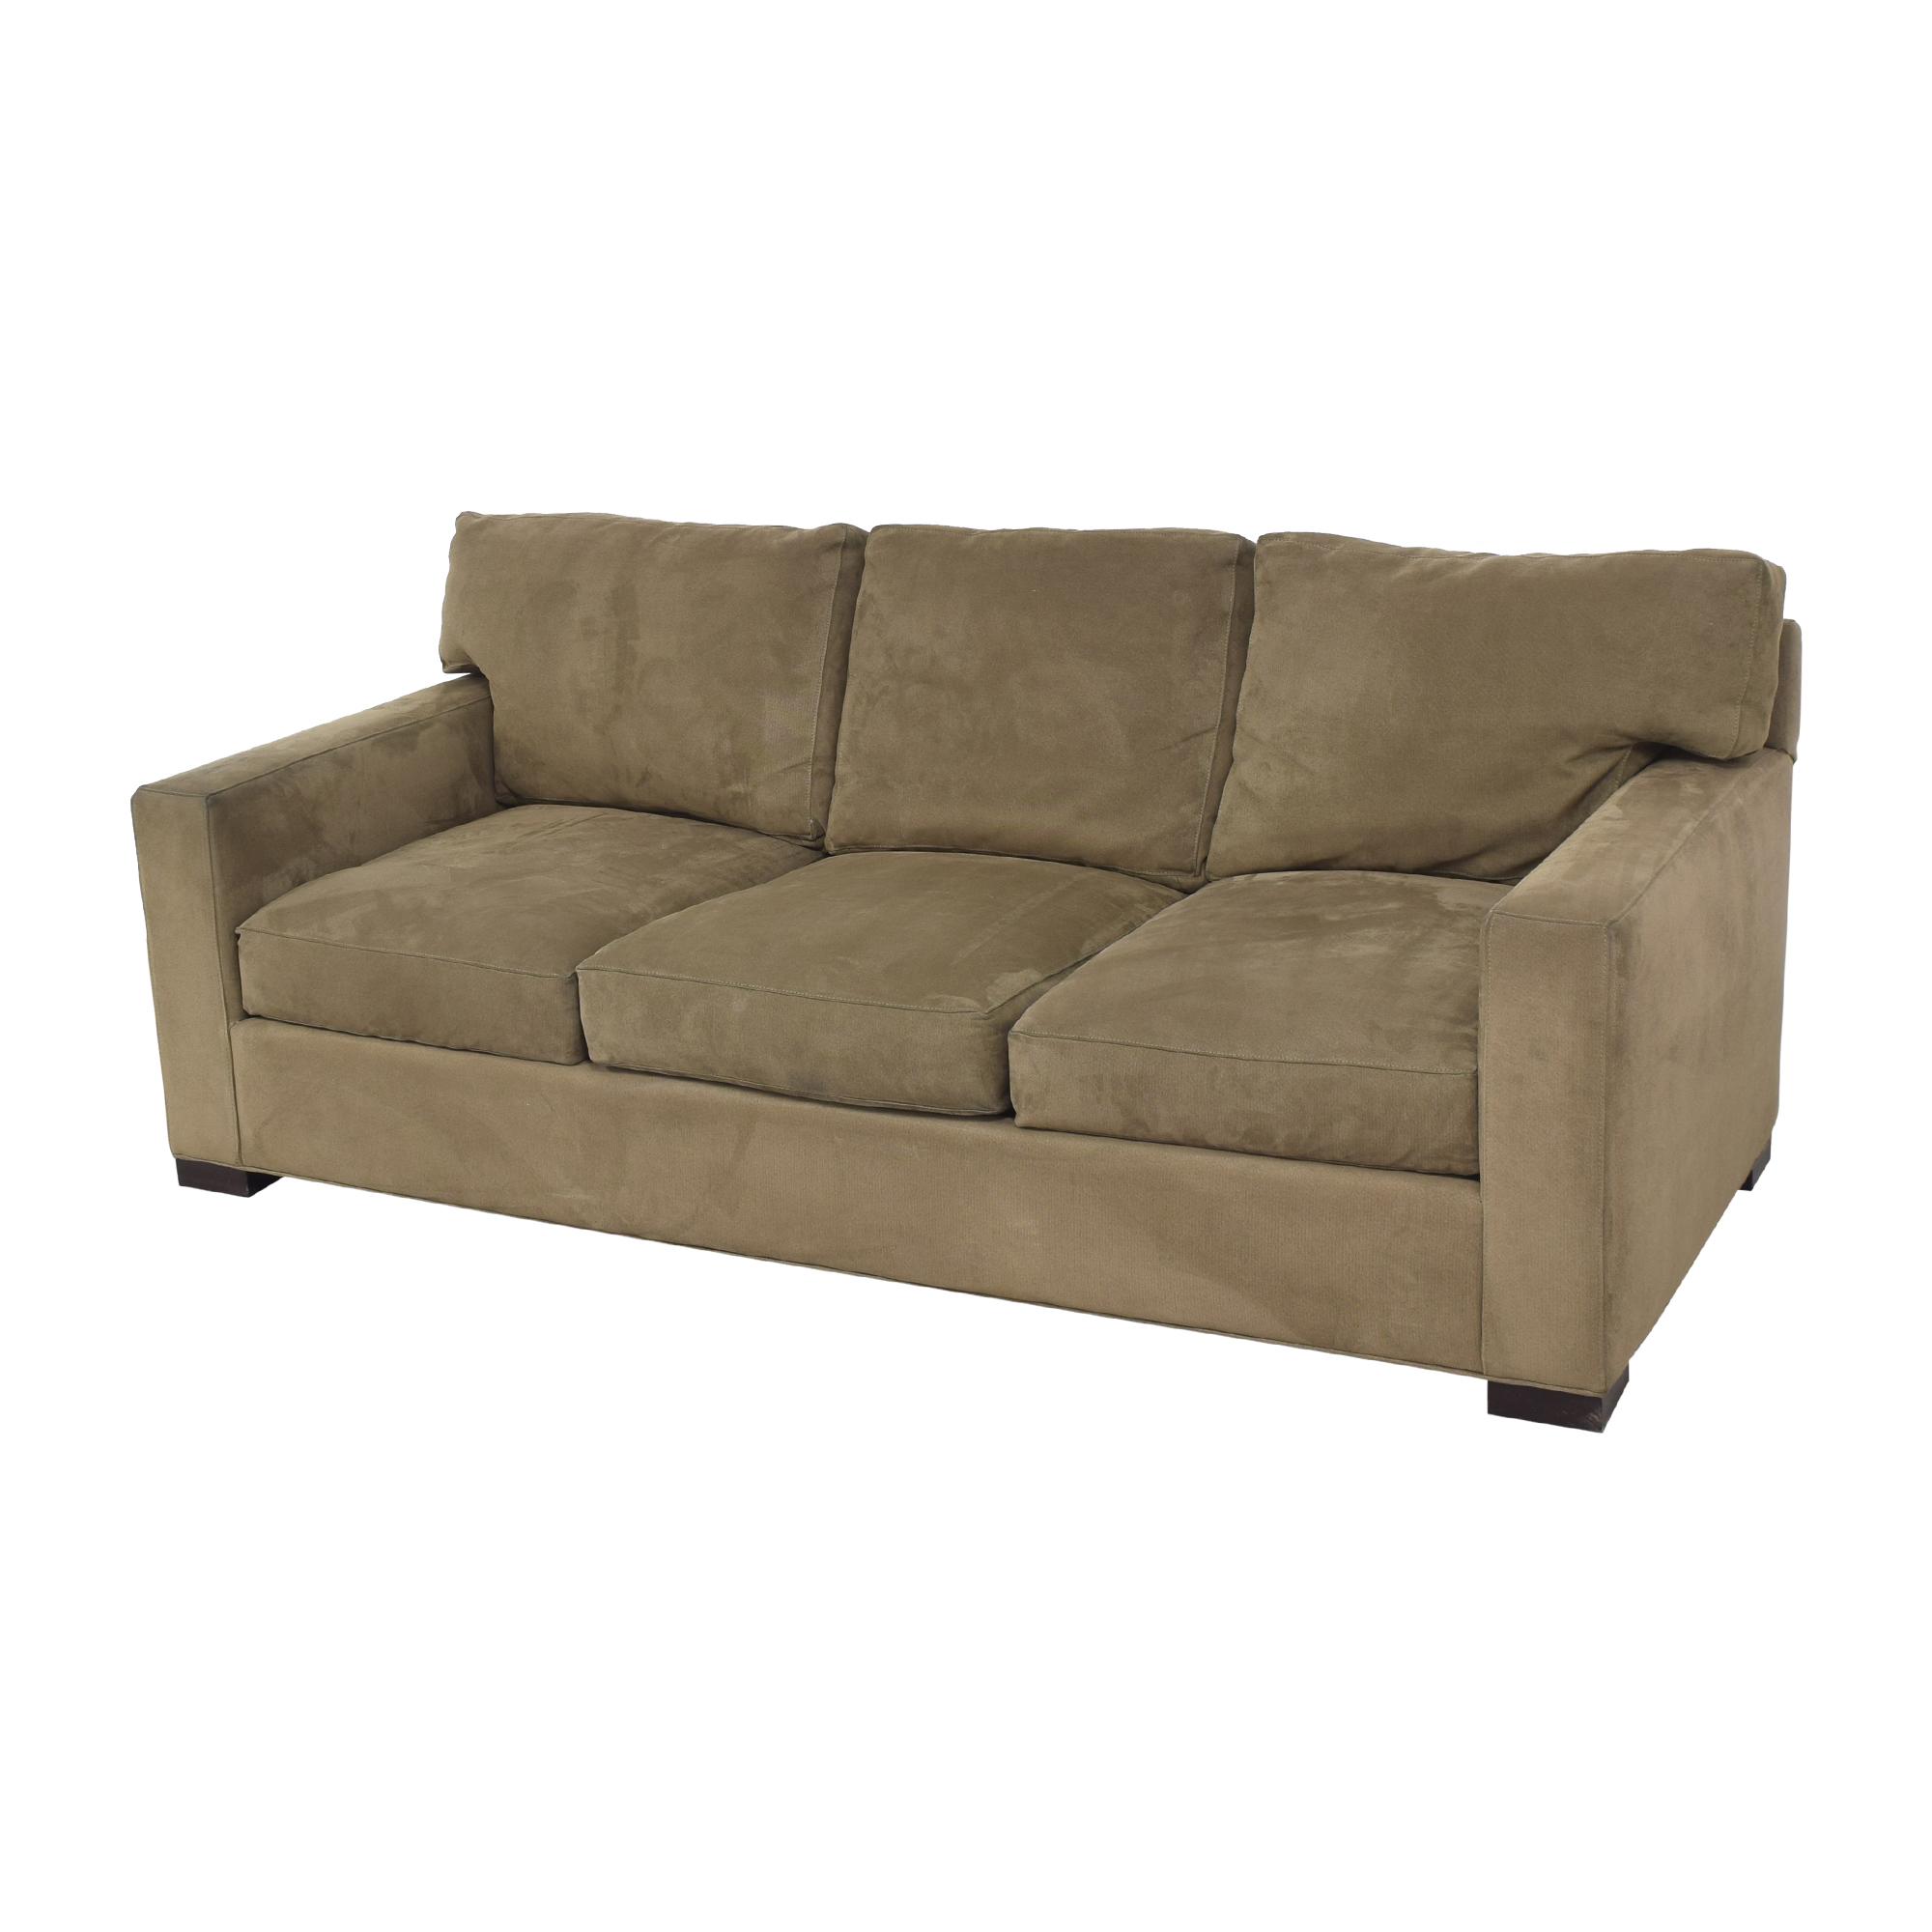 Crate & Barrel Crate & Barrel Axis Three Seat Sofa for sale